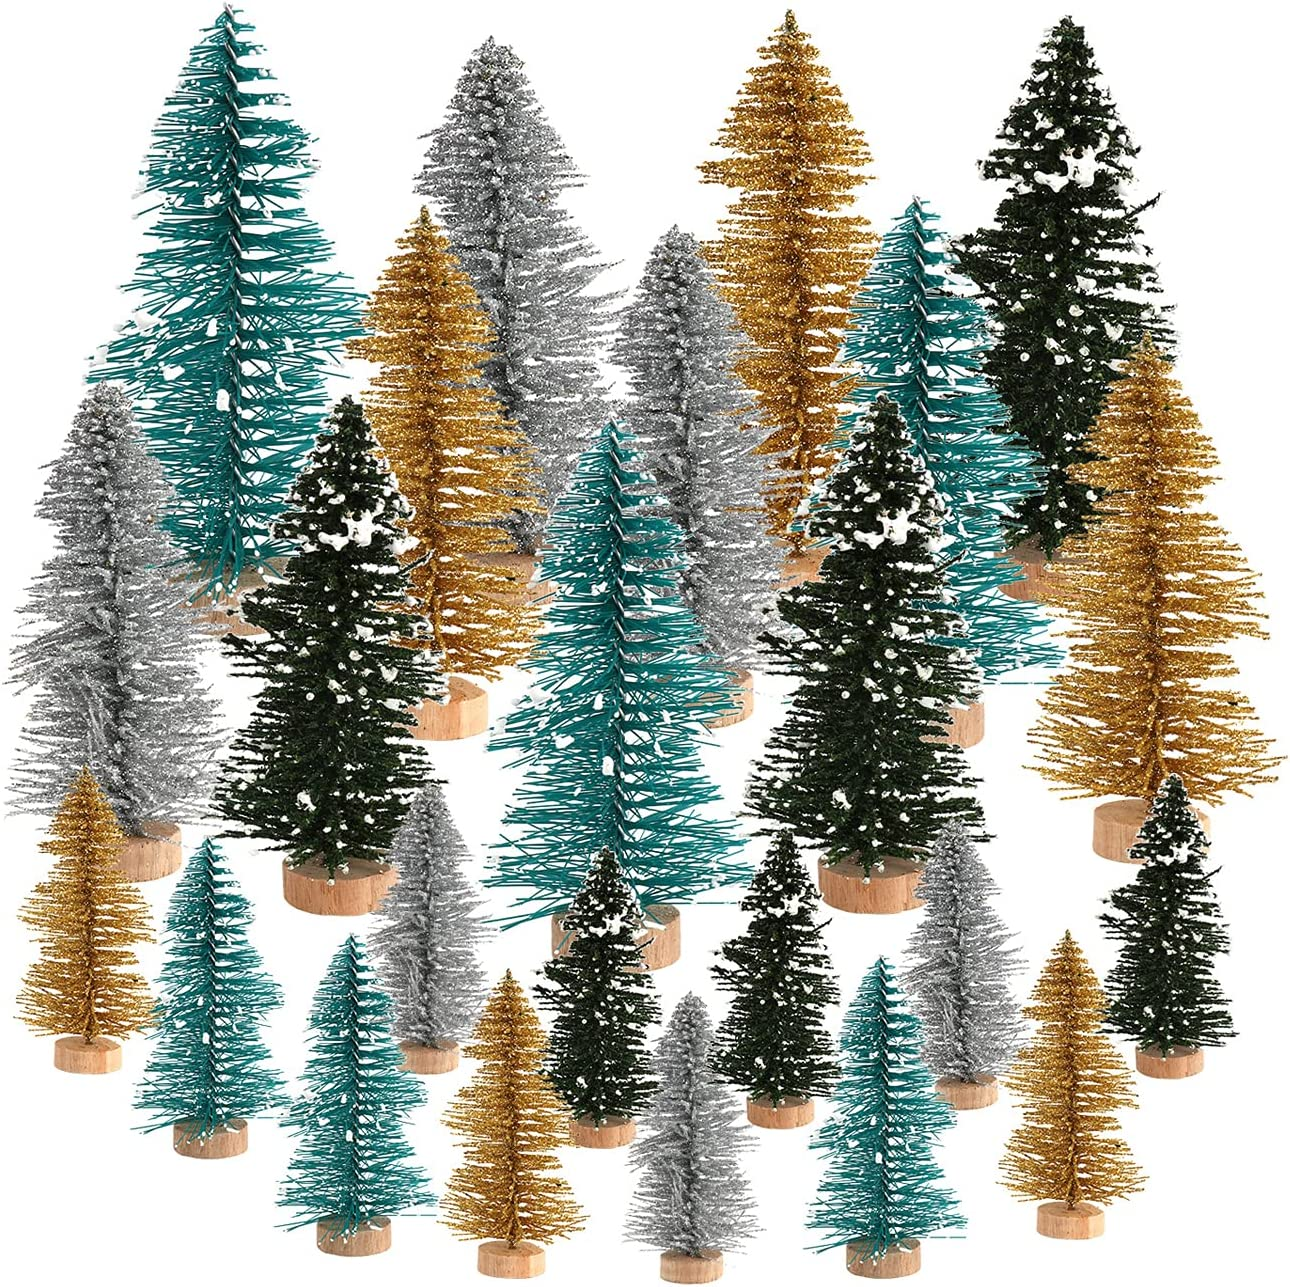 Atroy 48 PCS Mini Christmas Trees Financial sales sale Multicolor Artificial Sisal Financial sales sale S